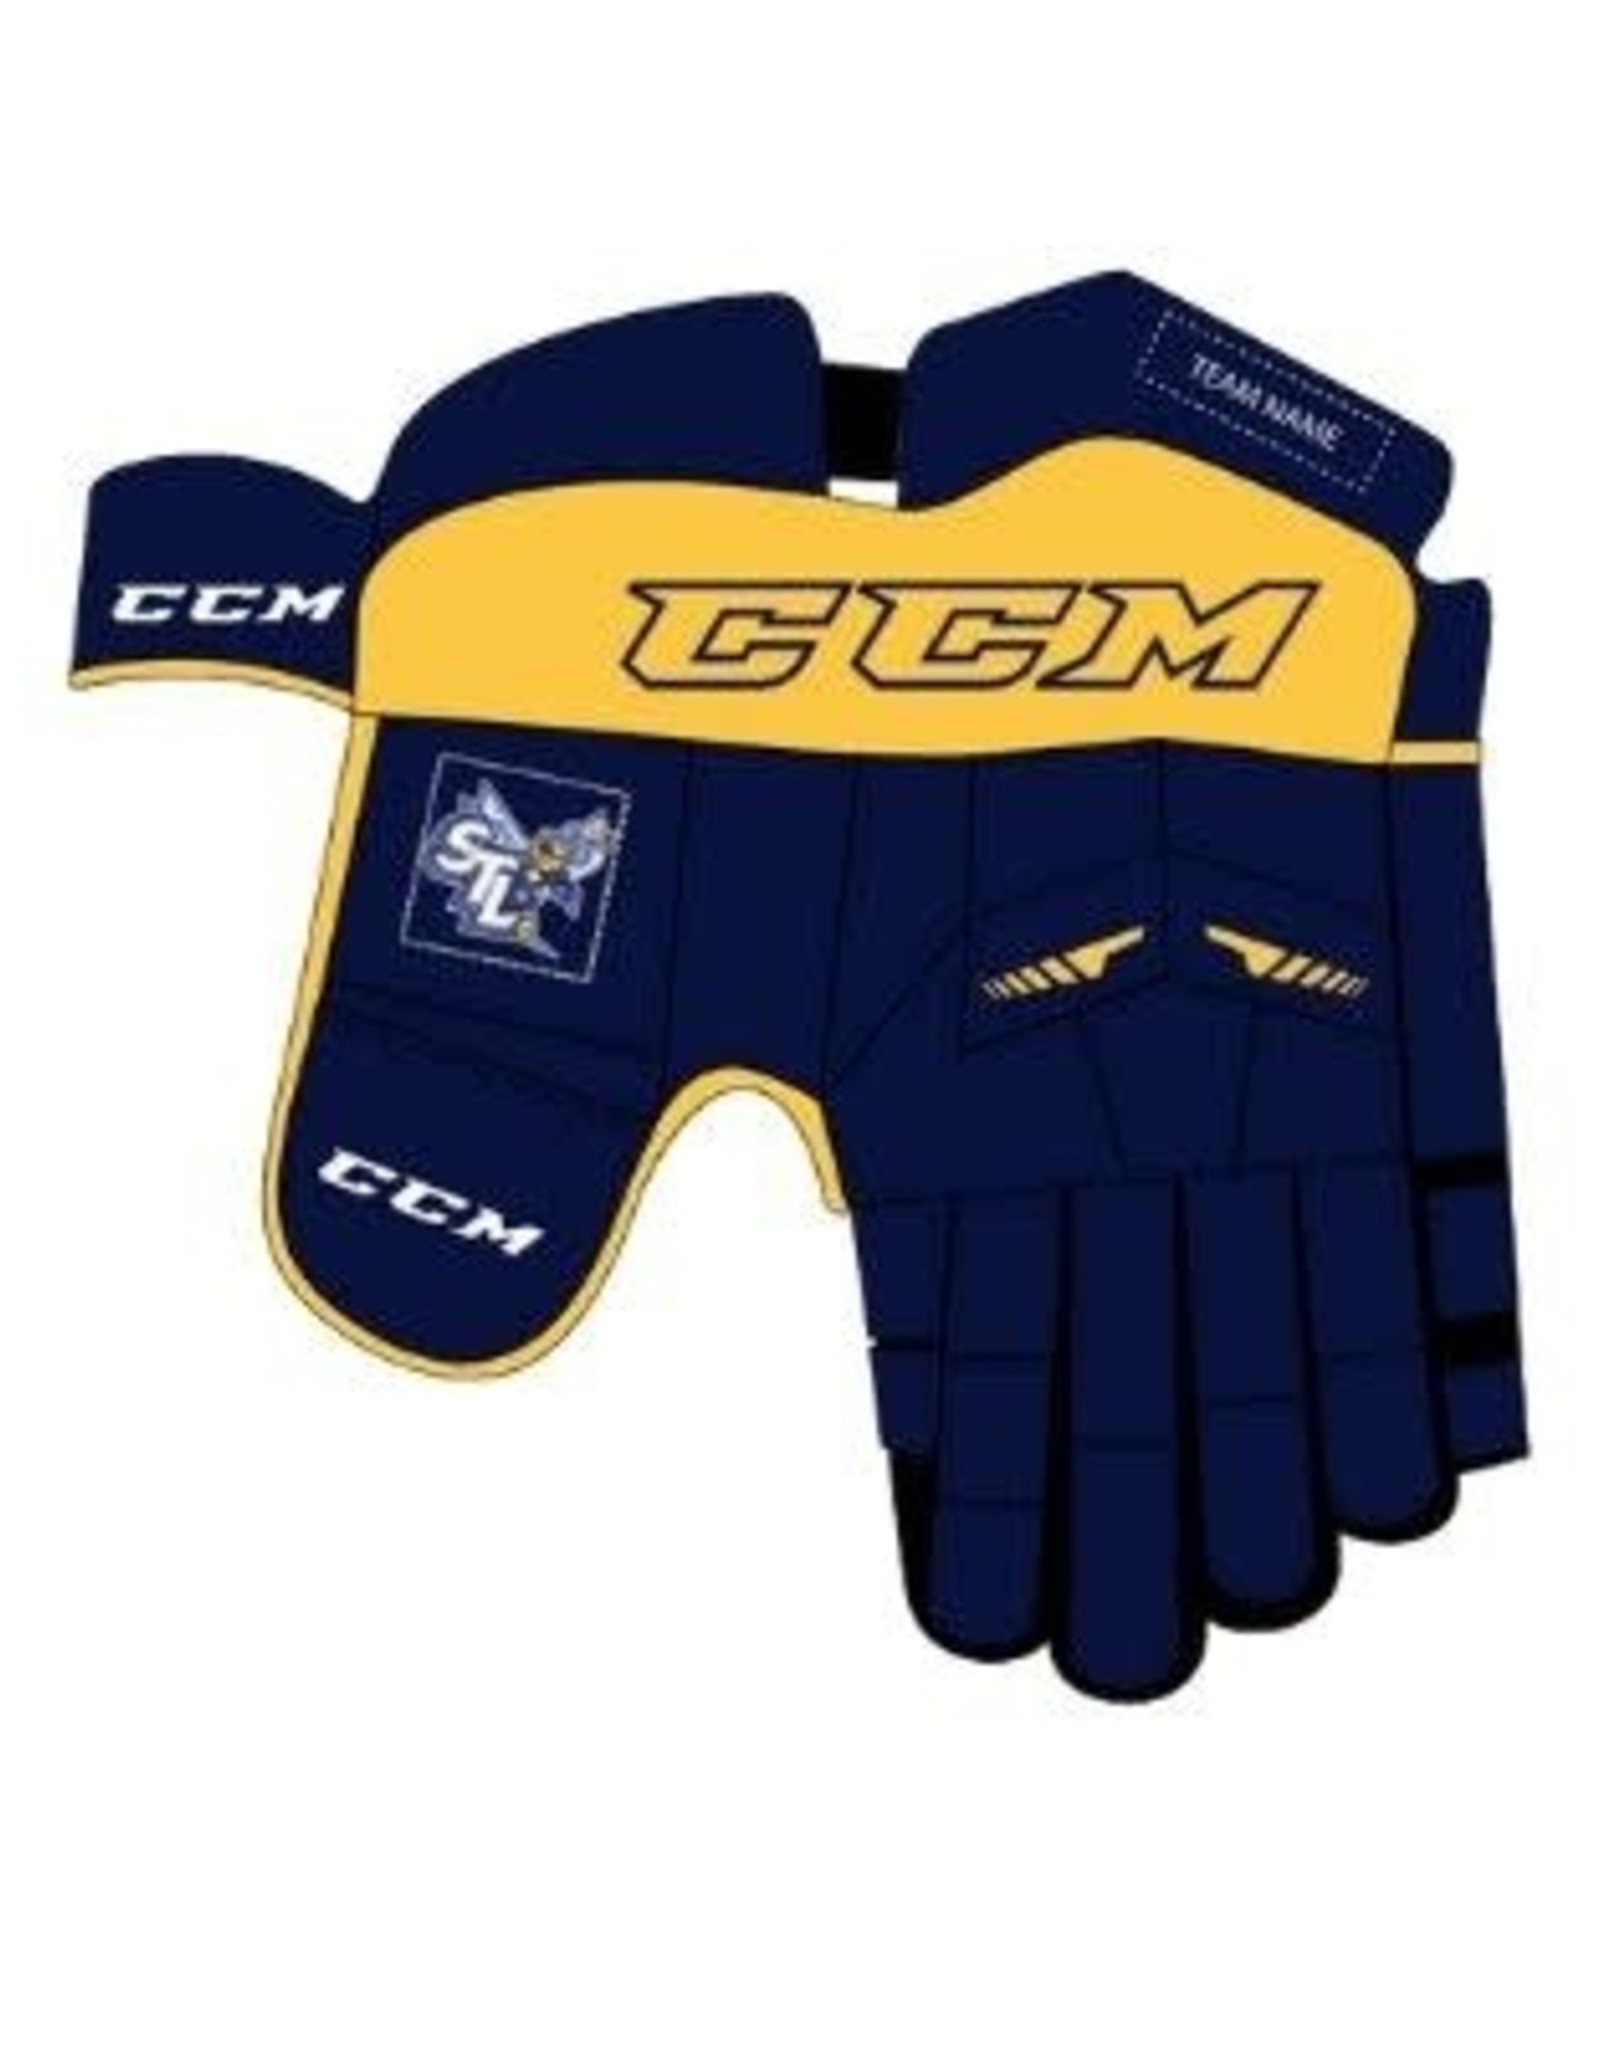 CCM Custom CCM St. Louis Sting Glove (JUNIOR) Navy